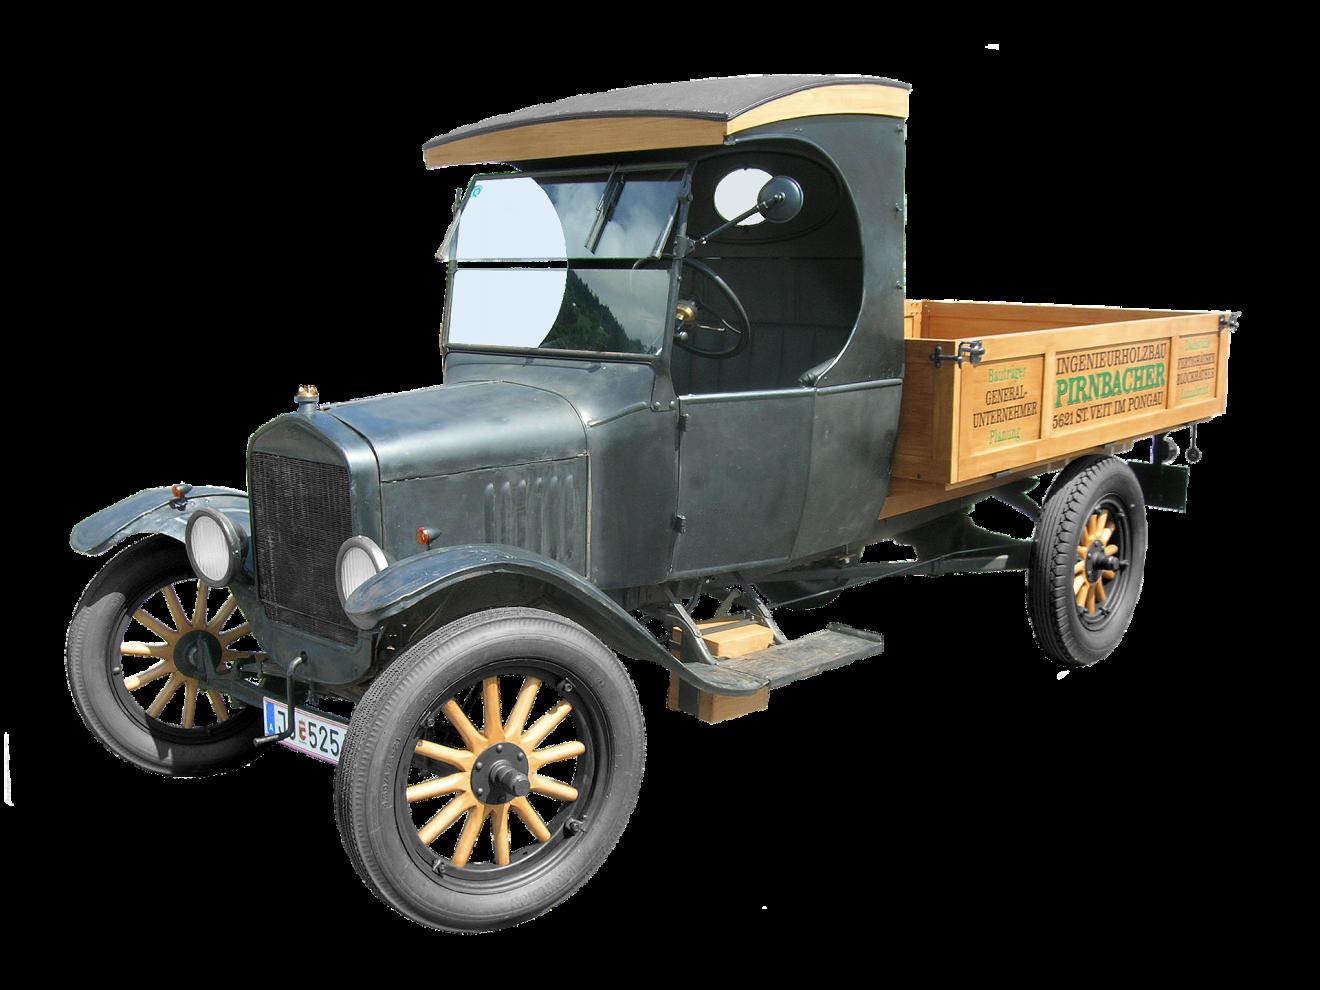 truck-2509323_1920